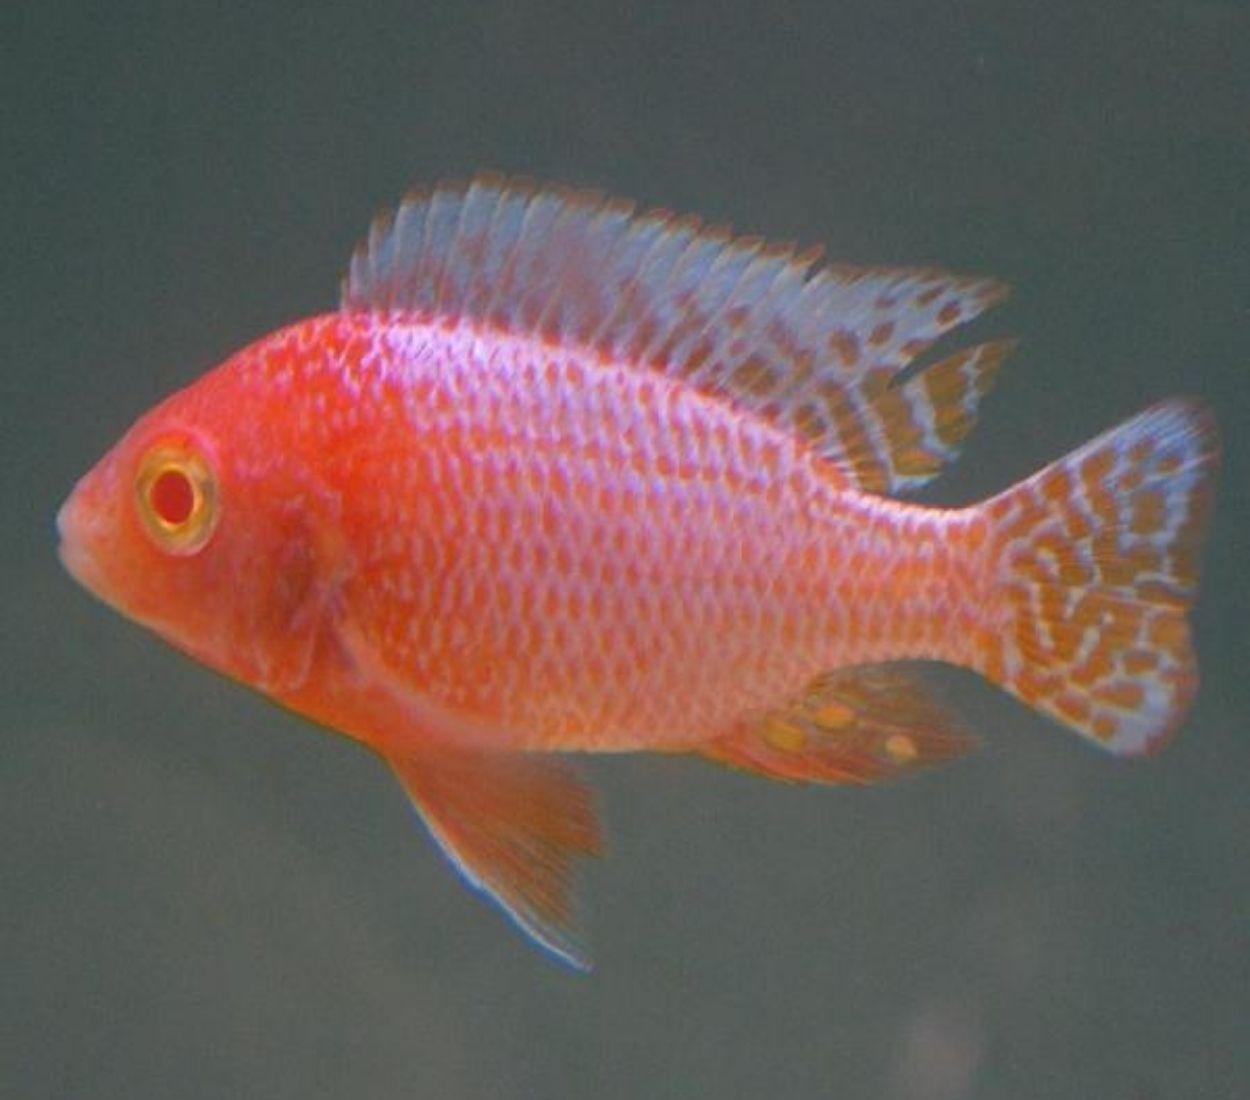 Aulonocara Fire Fish Albina 5 a 7 cm | Ciclídeos Africanos | Lago Malawi  - KAUAR